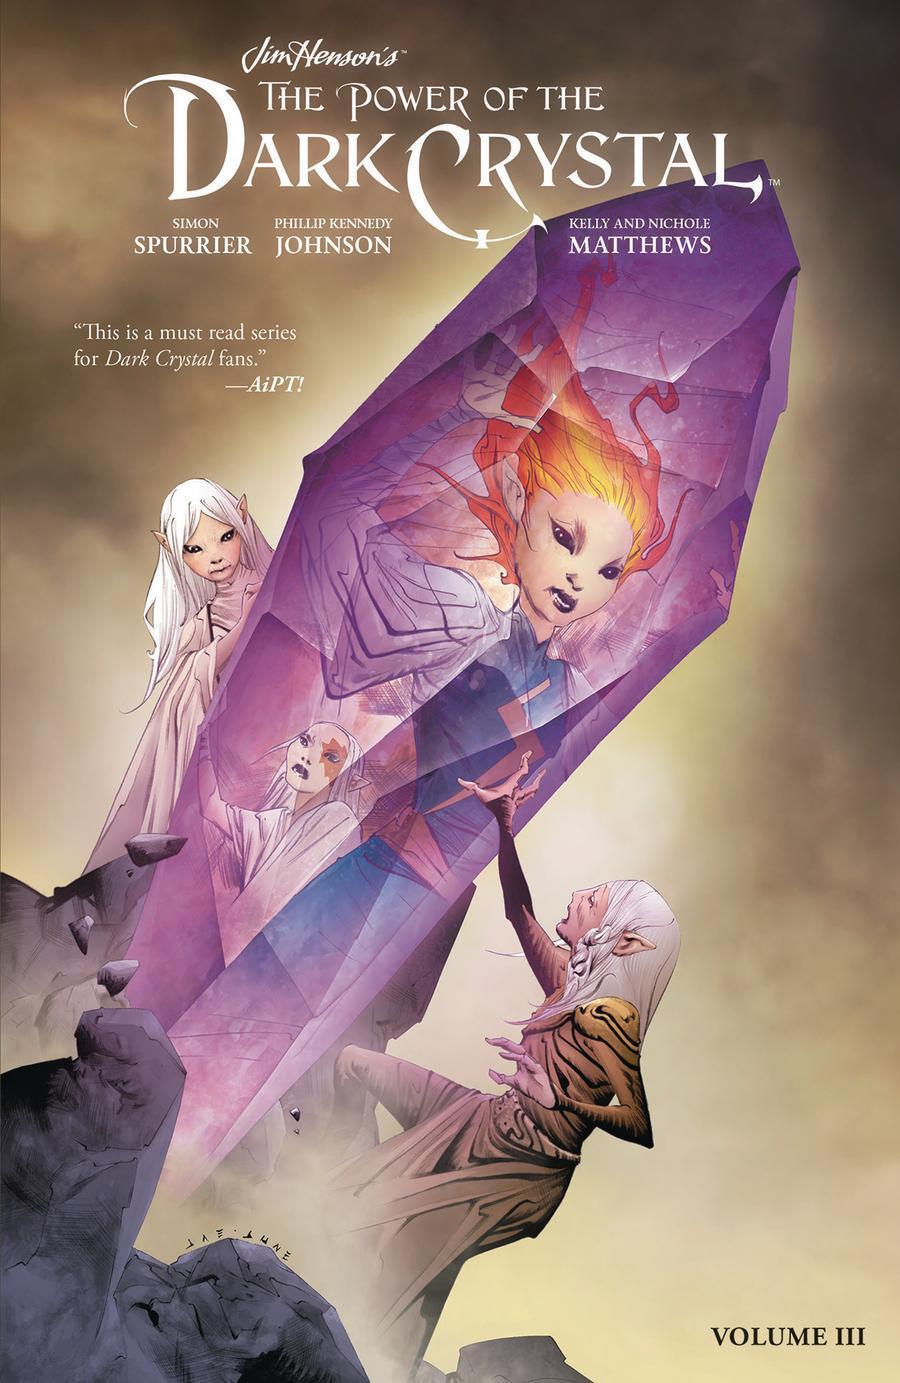 Jim Hensons Power Of The Dark Crystal Vol 3 TP